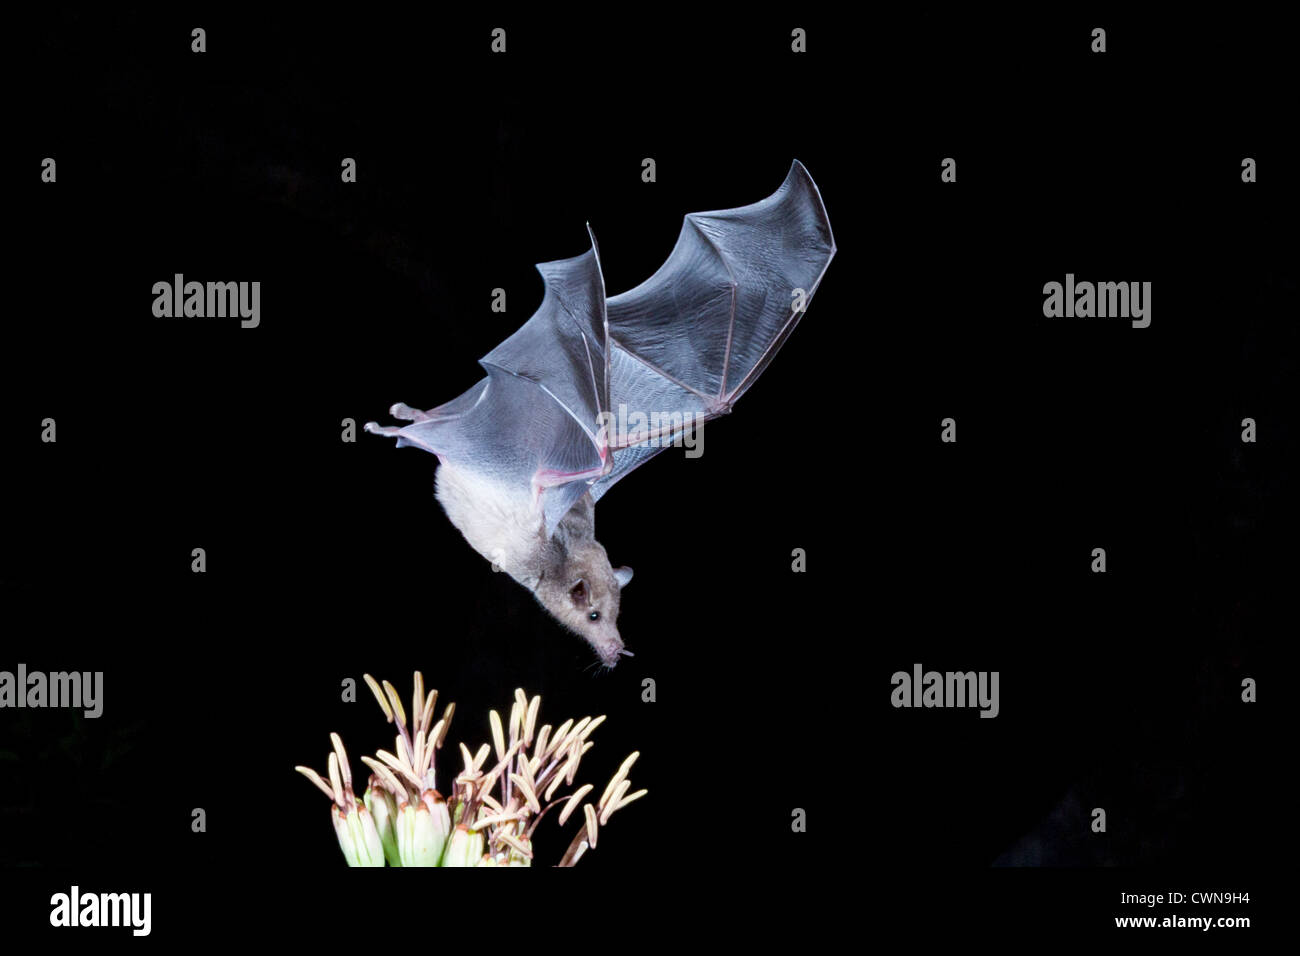 Nectar feeding bat, the endangered Lesser Long-nosed bat, Leptonycteris yerbabuenae, feeding on nectar at night, in Arizona. Stock Photo